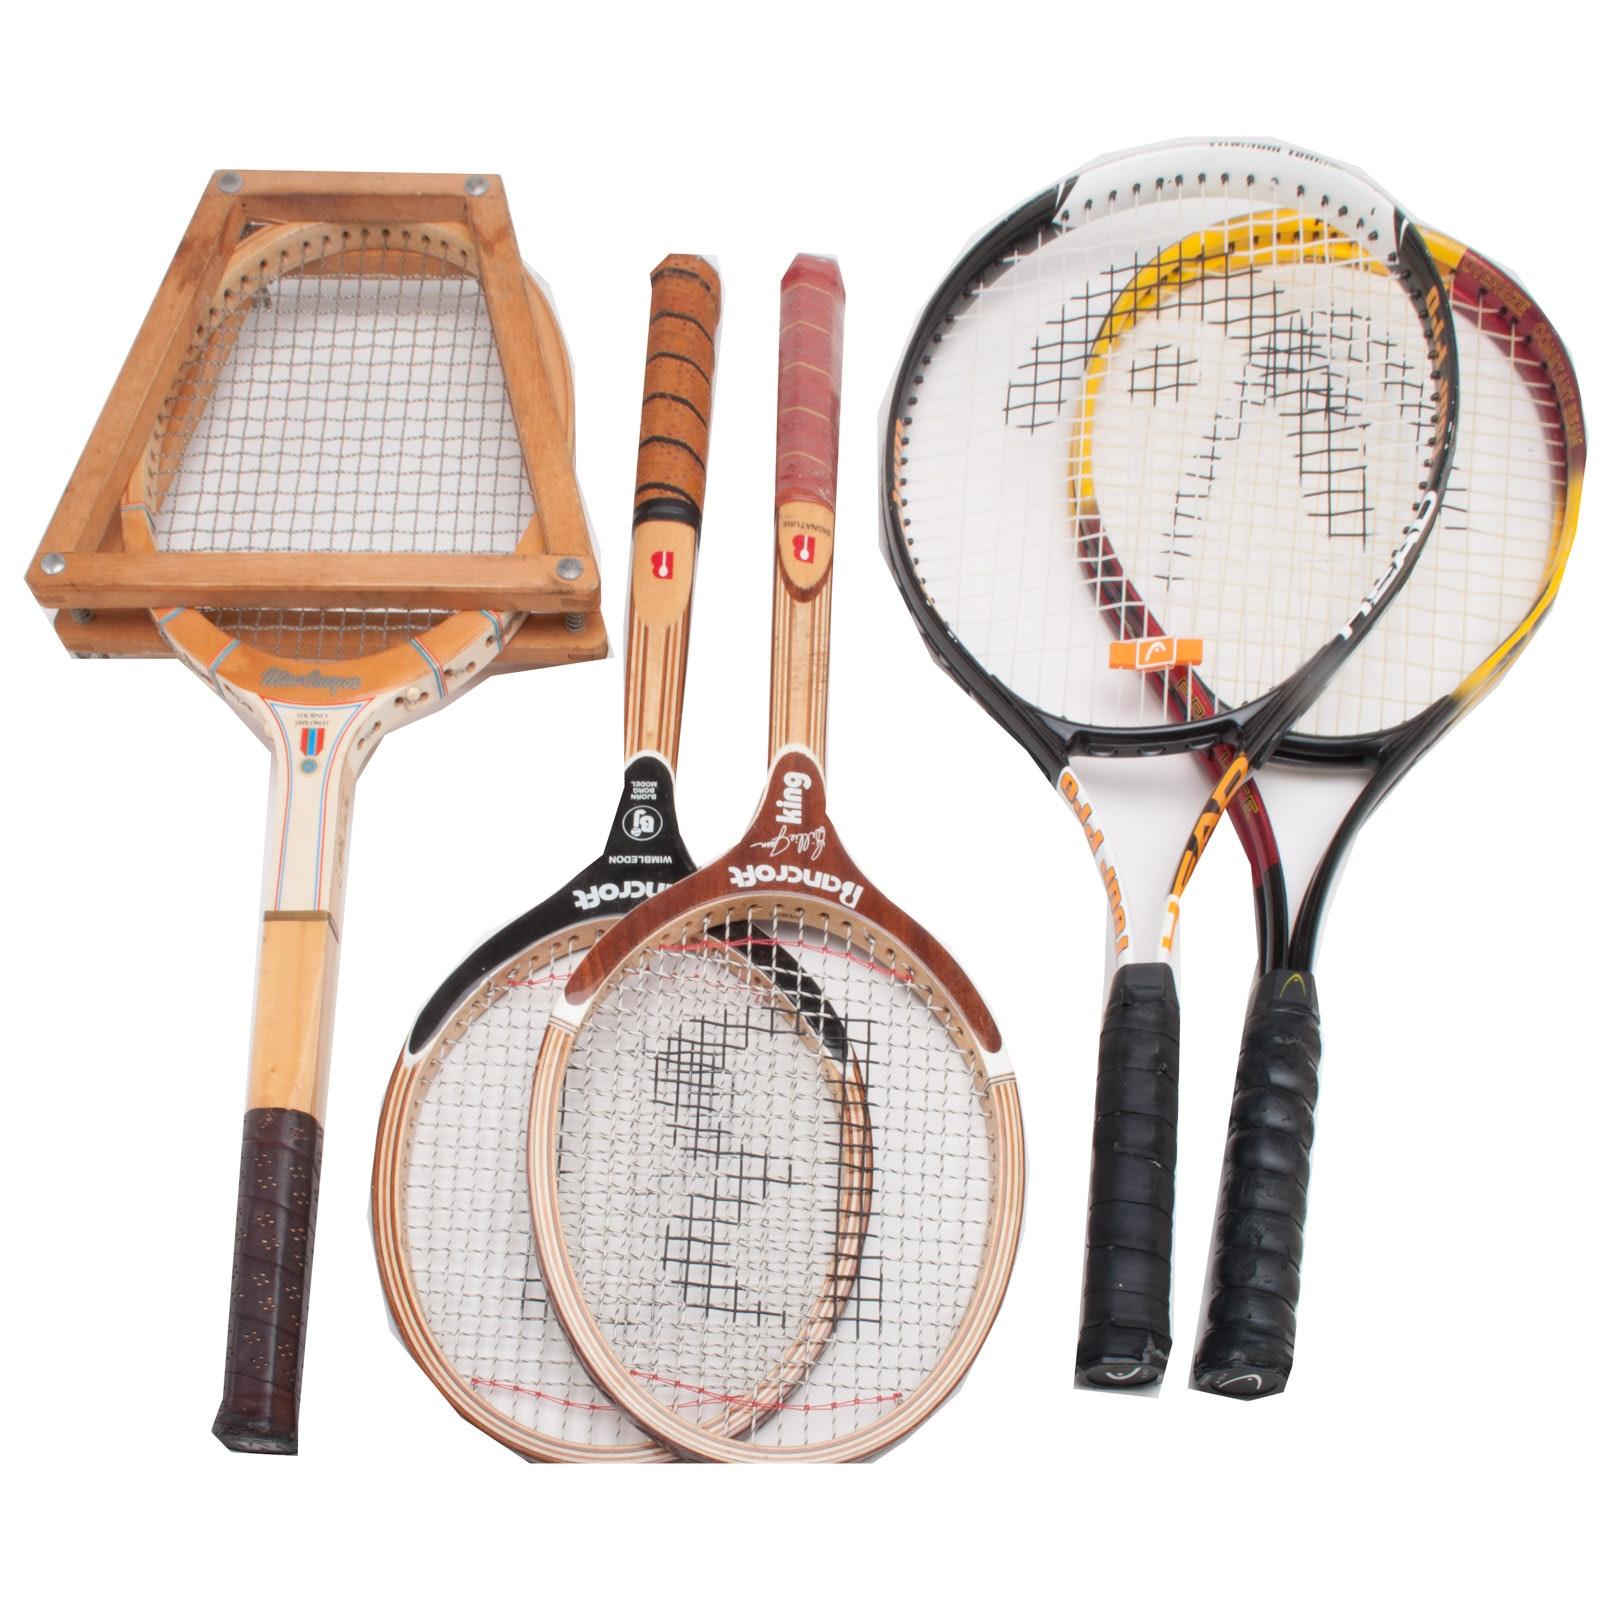 Five Tennis Racquets